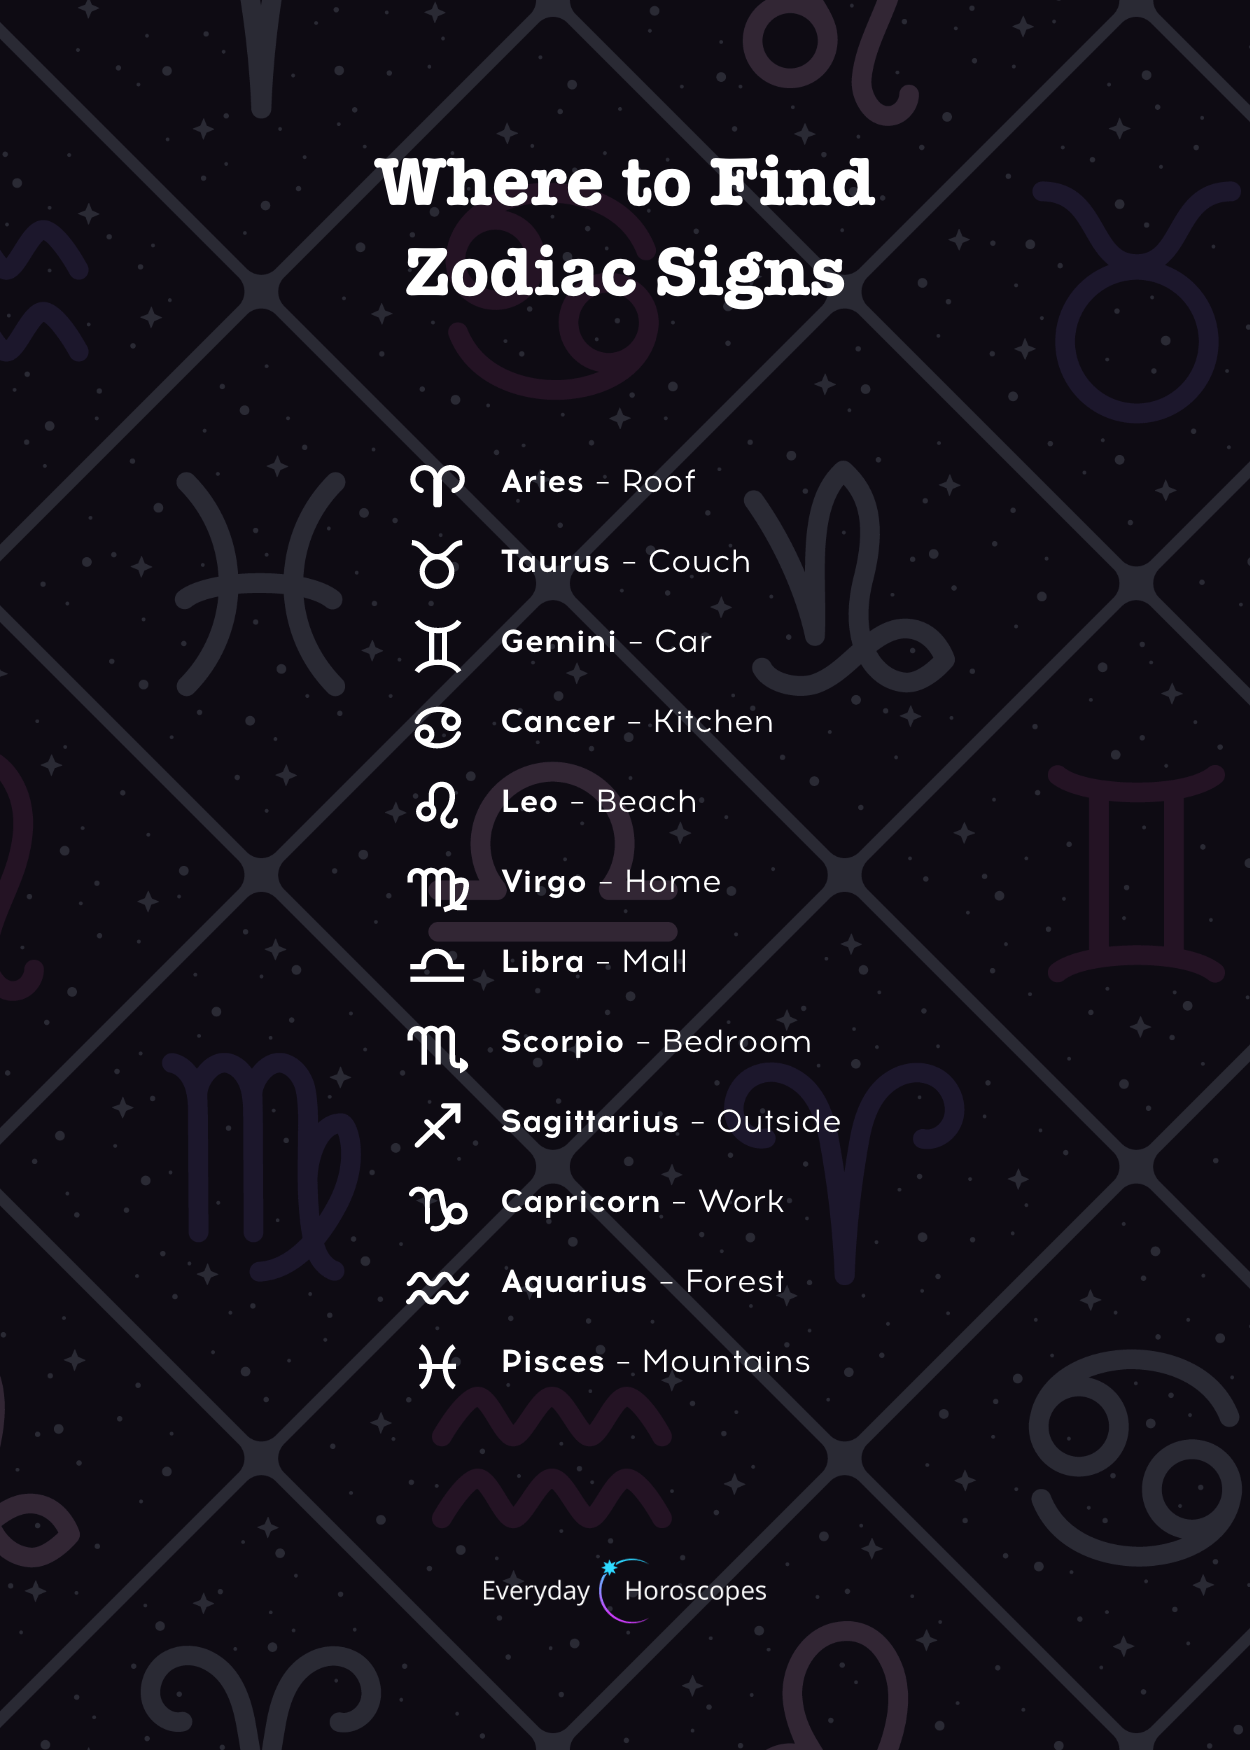 Zodiac Stereotypes Zodiac Signs Aquarius Zodiac Signs Sagittarius Zodiac Signs Gemini